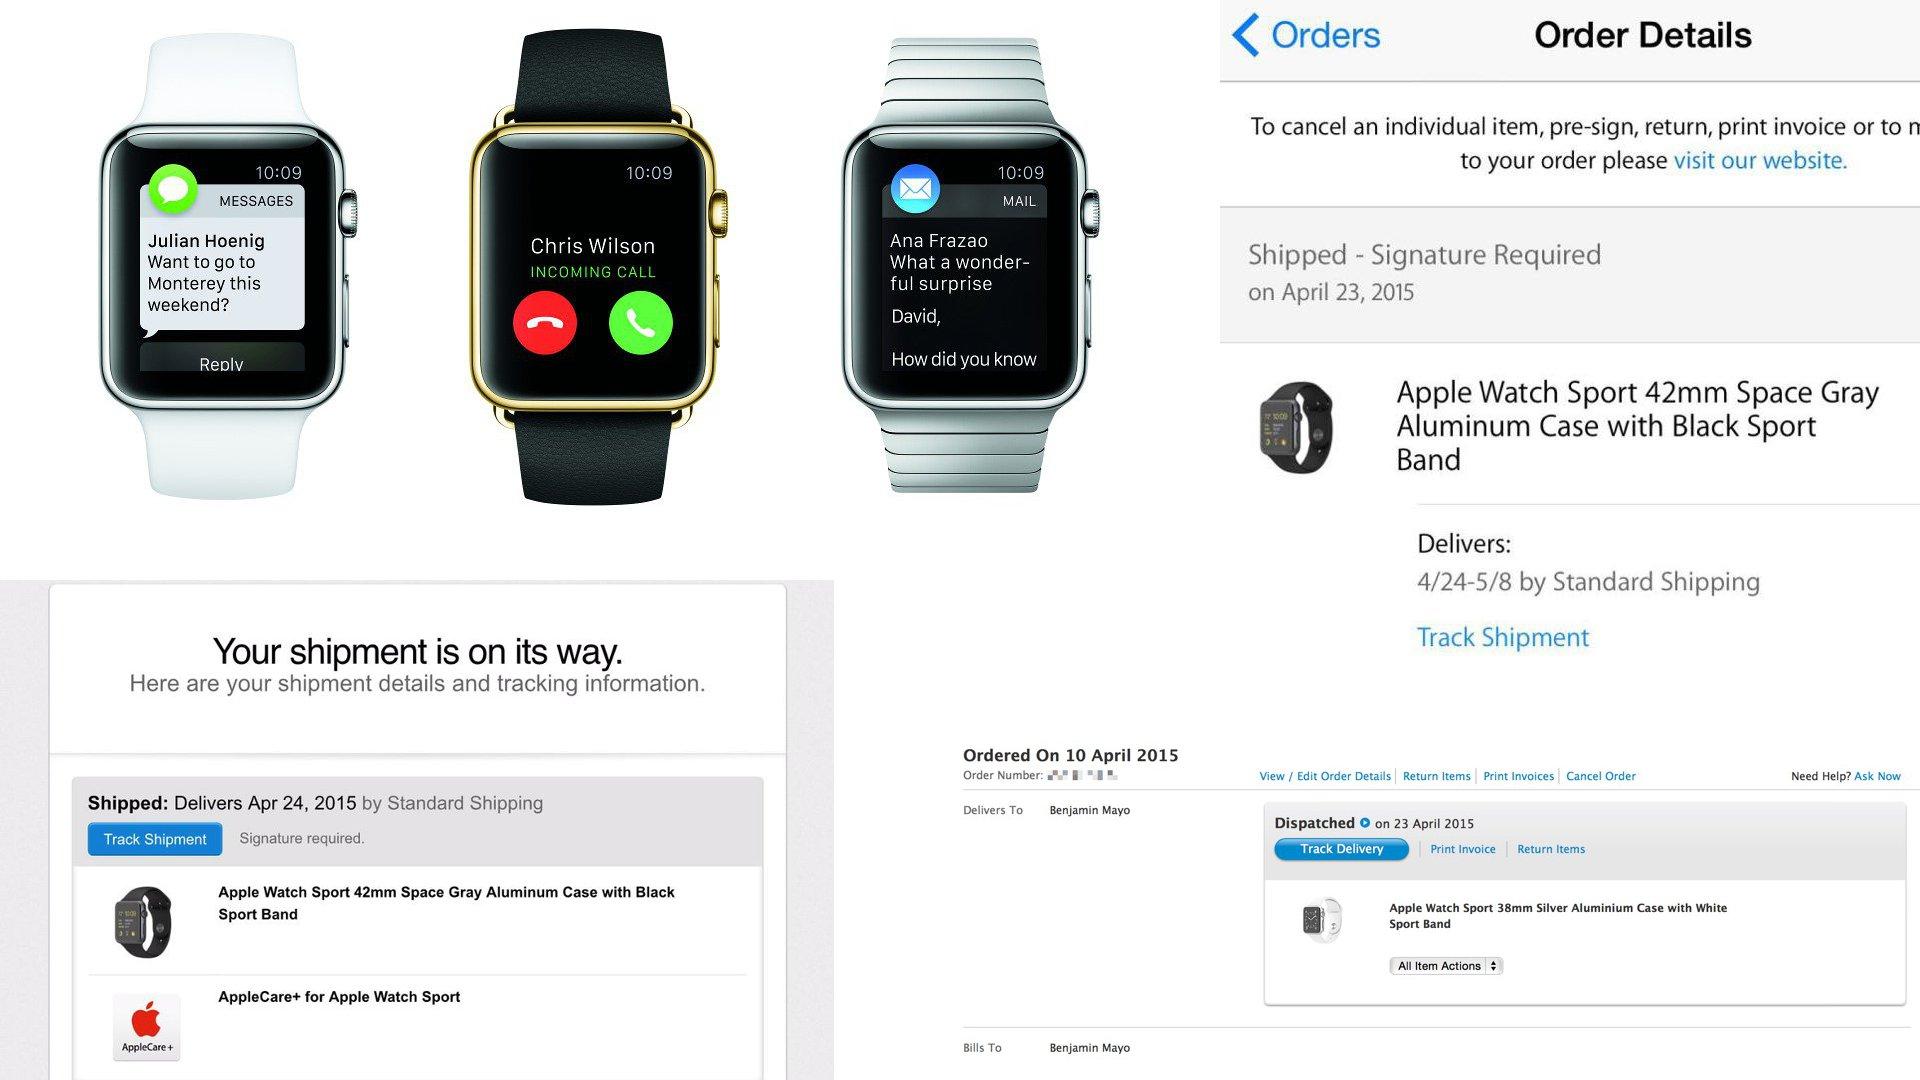 Apple Watch Shipment Details